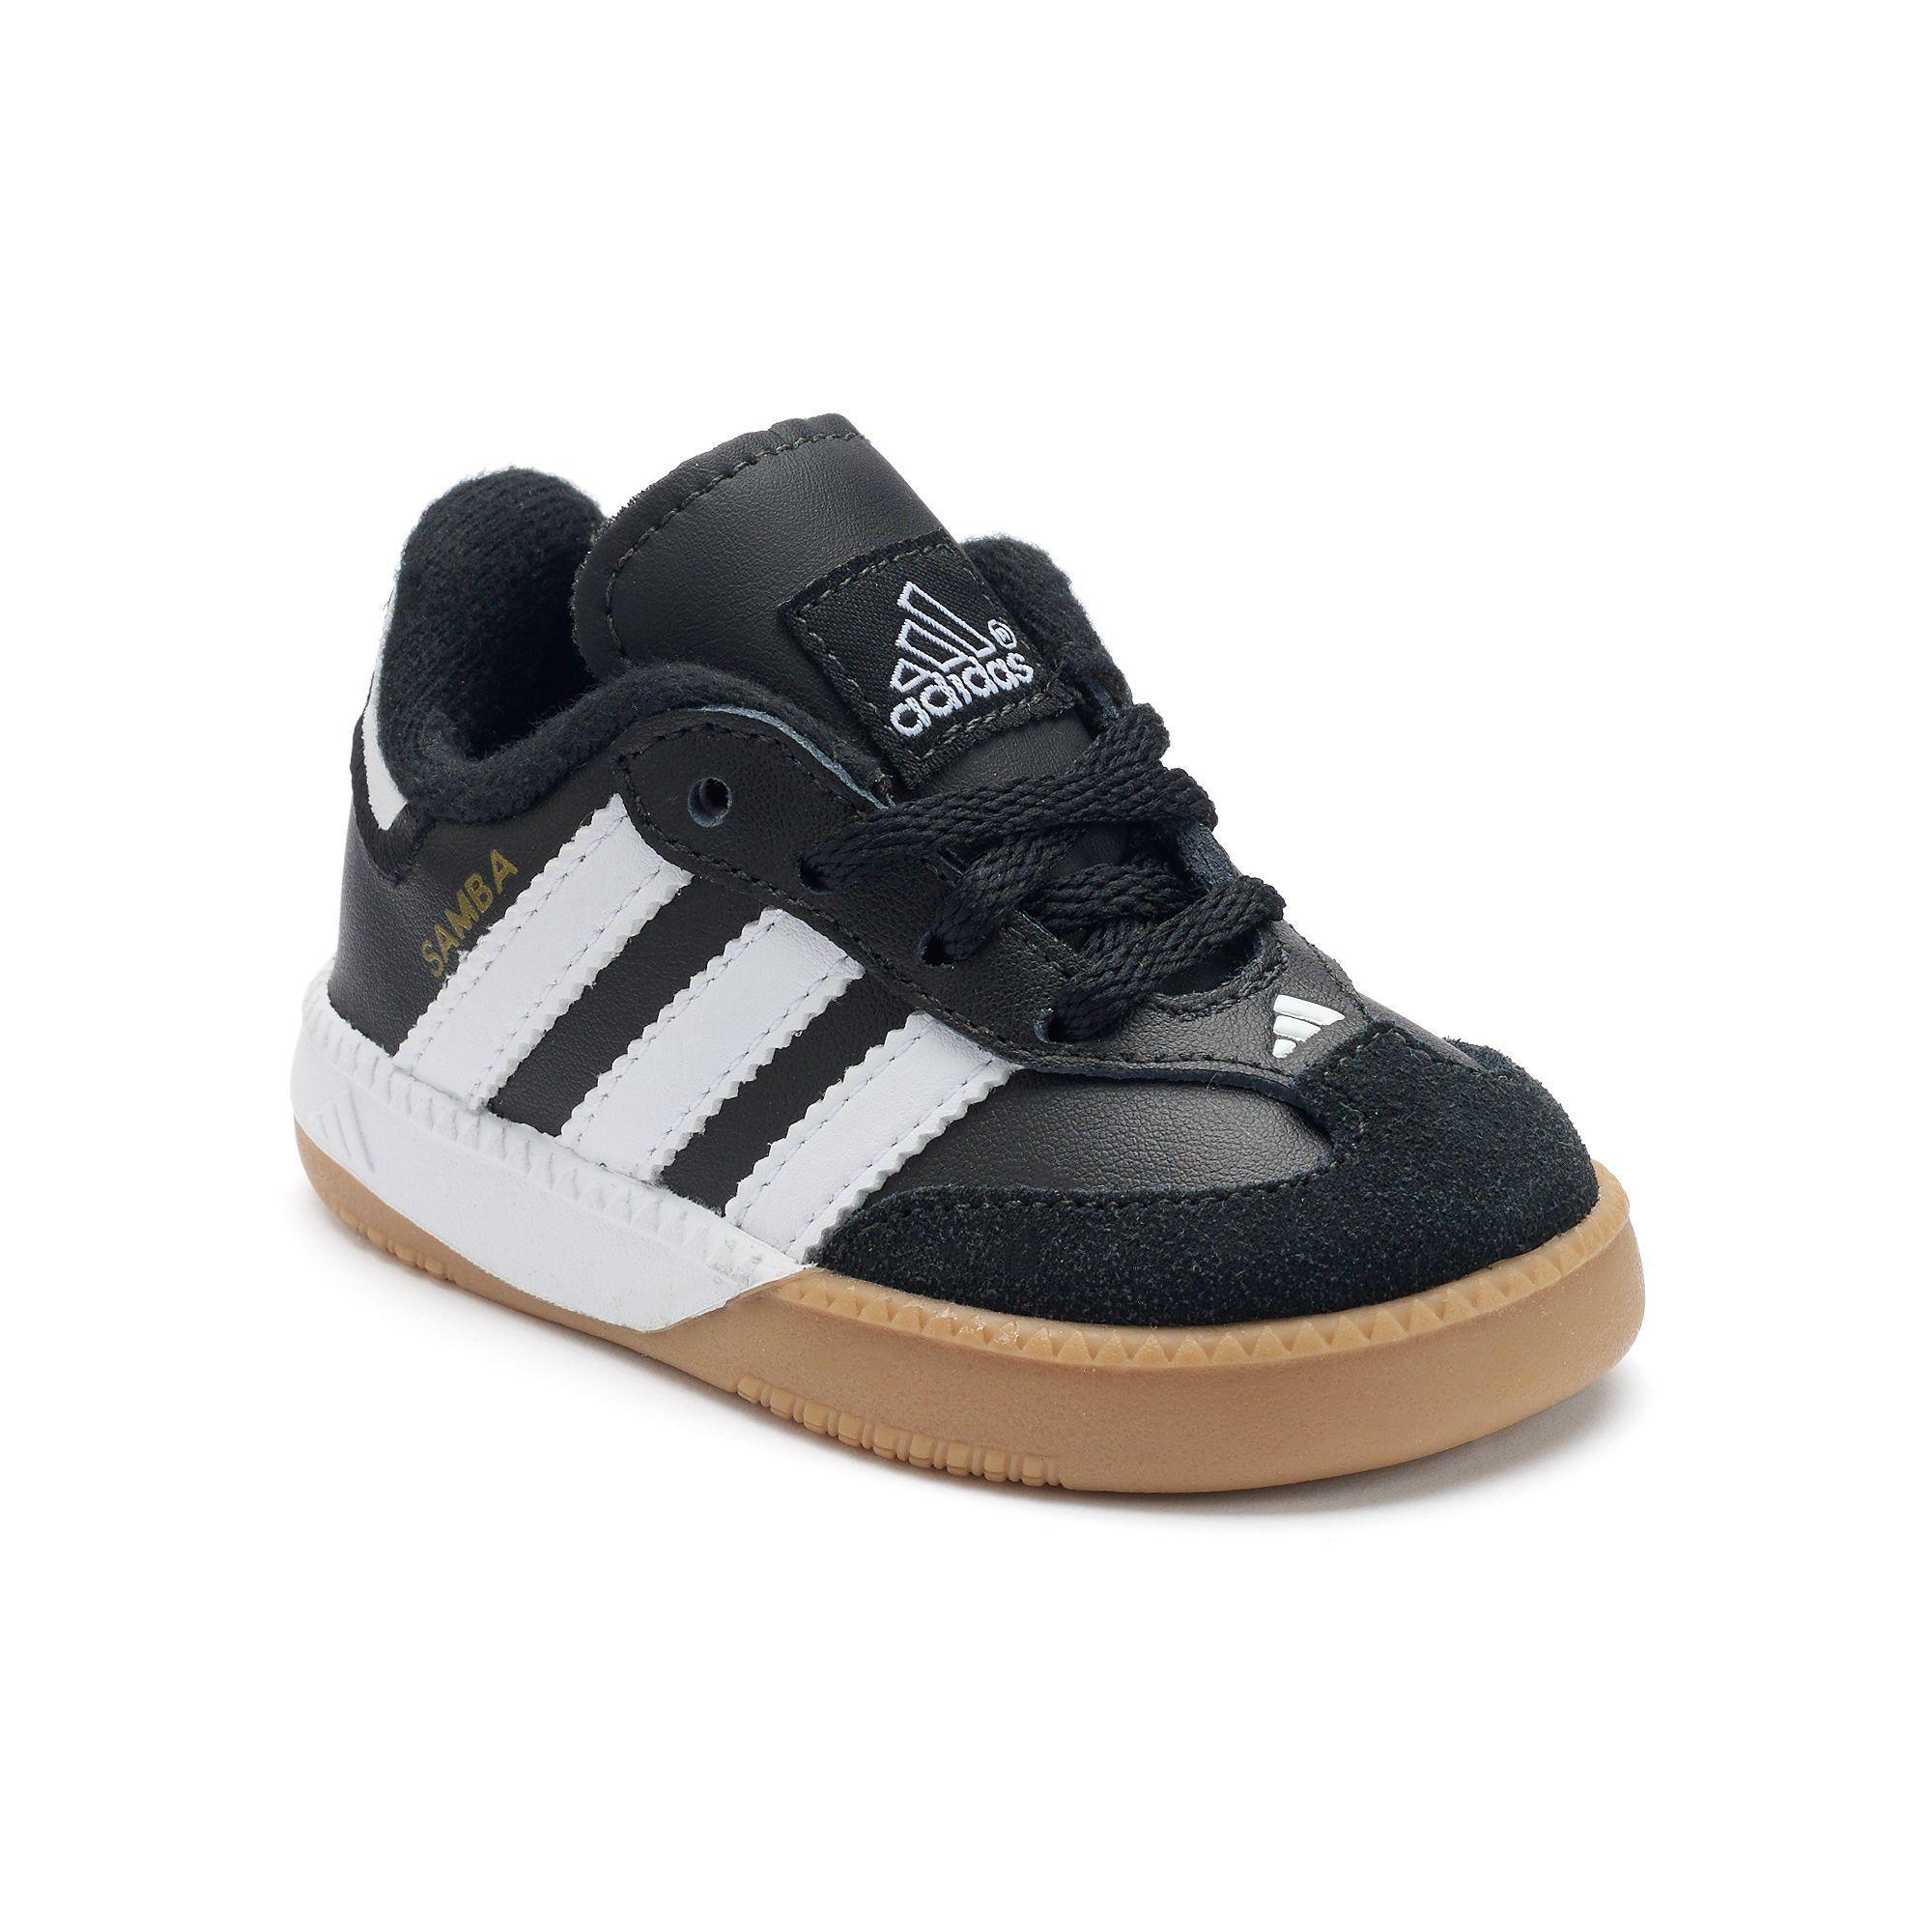 Adidas Samba Millennium Baby / Toddler Boys' Shoes, Toddler Boy's, Size: 9